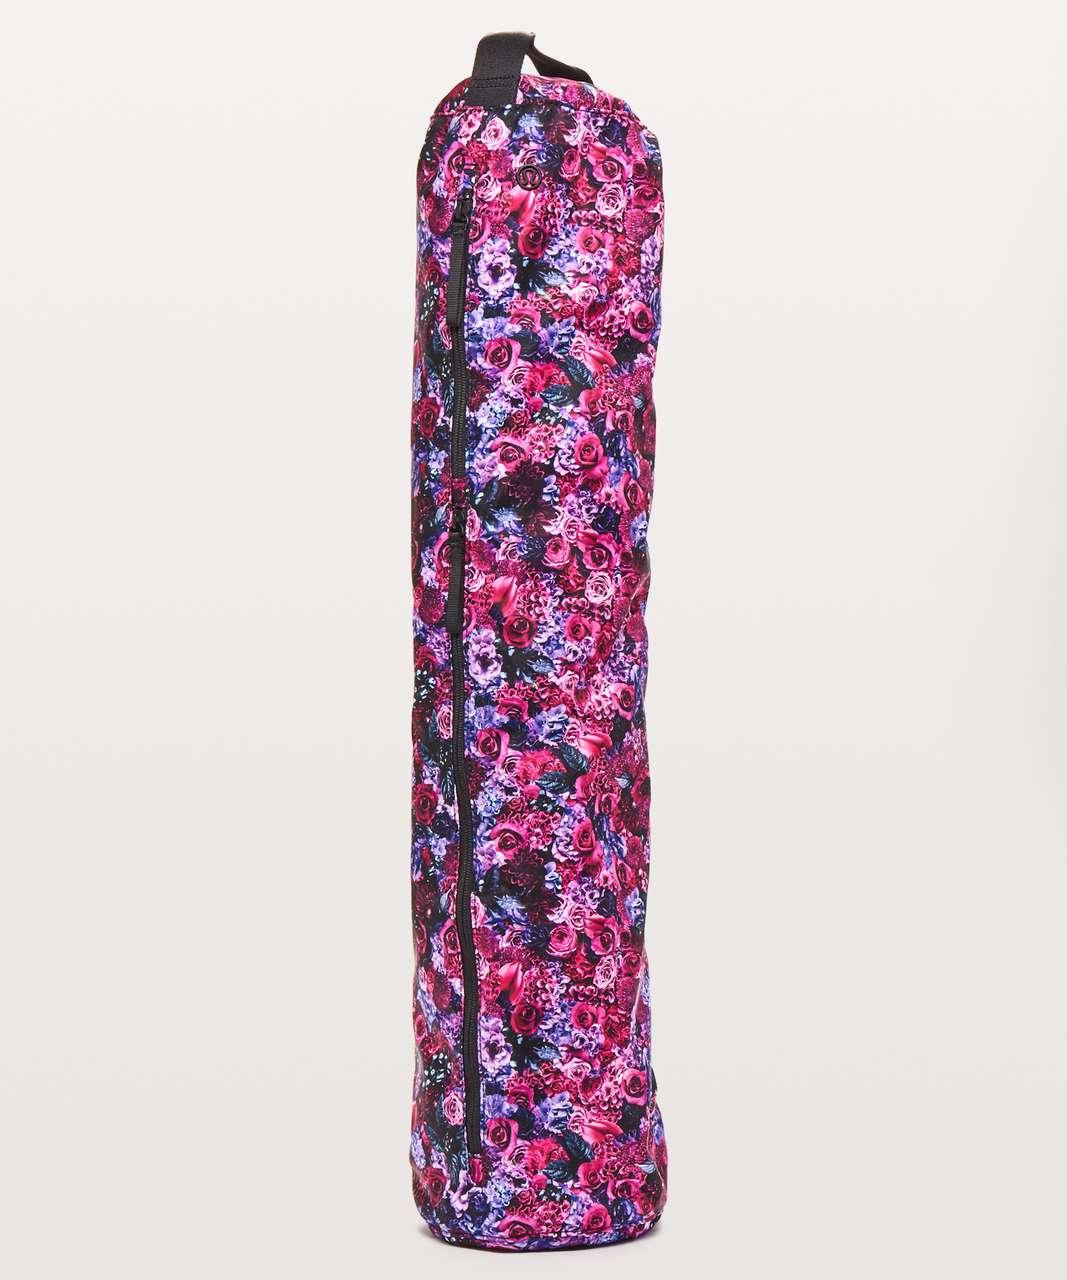 e2b8190b97b Lululemon Get Rolling Yoga Mat Bag *17L - In Bloom Multi / Black - lulu  fanatics